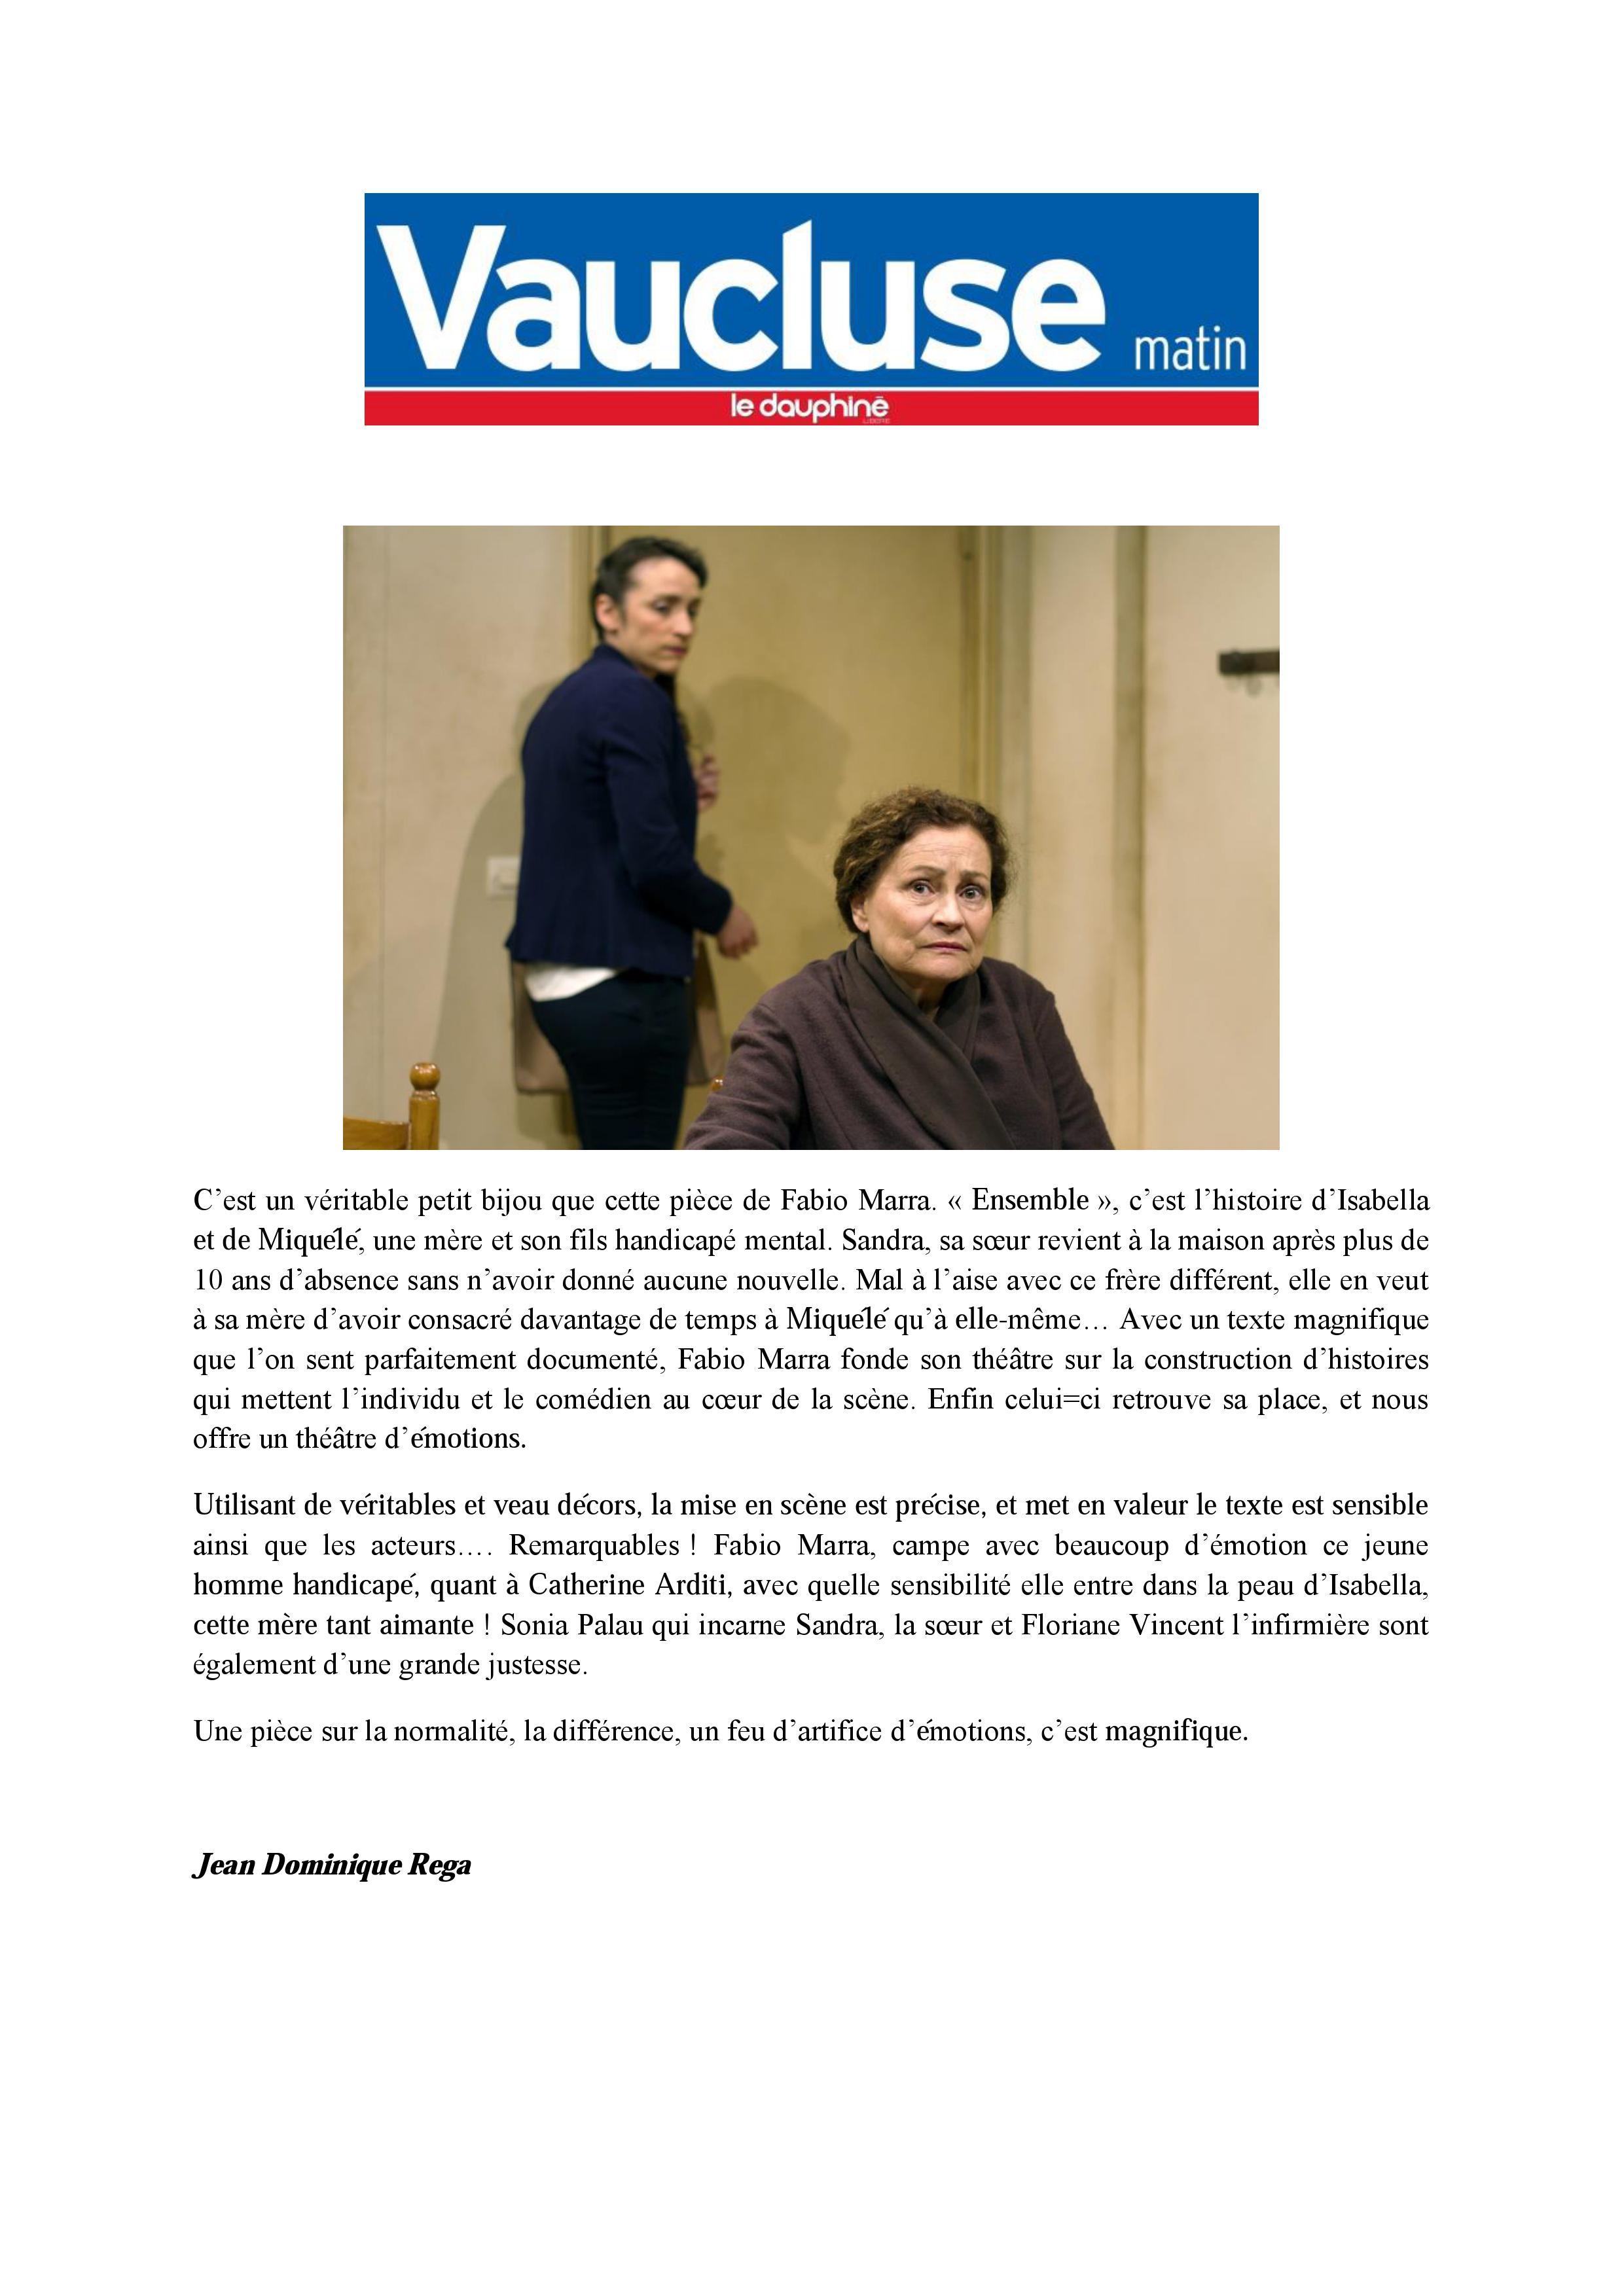 vaucluse-2eme-article